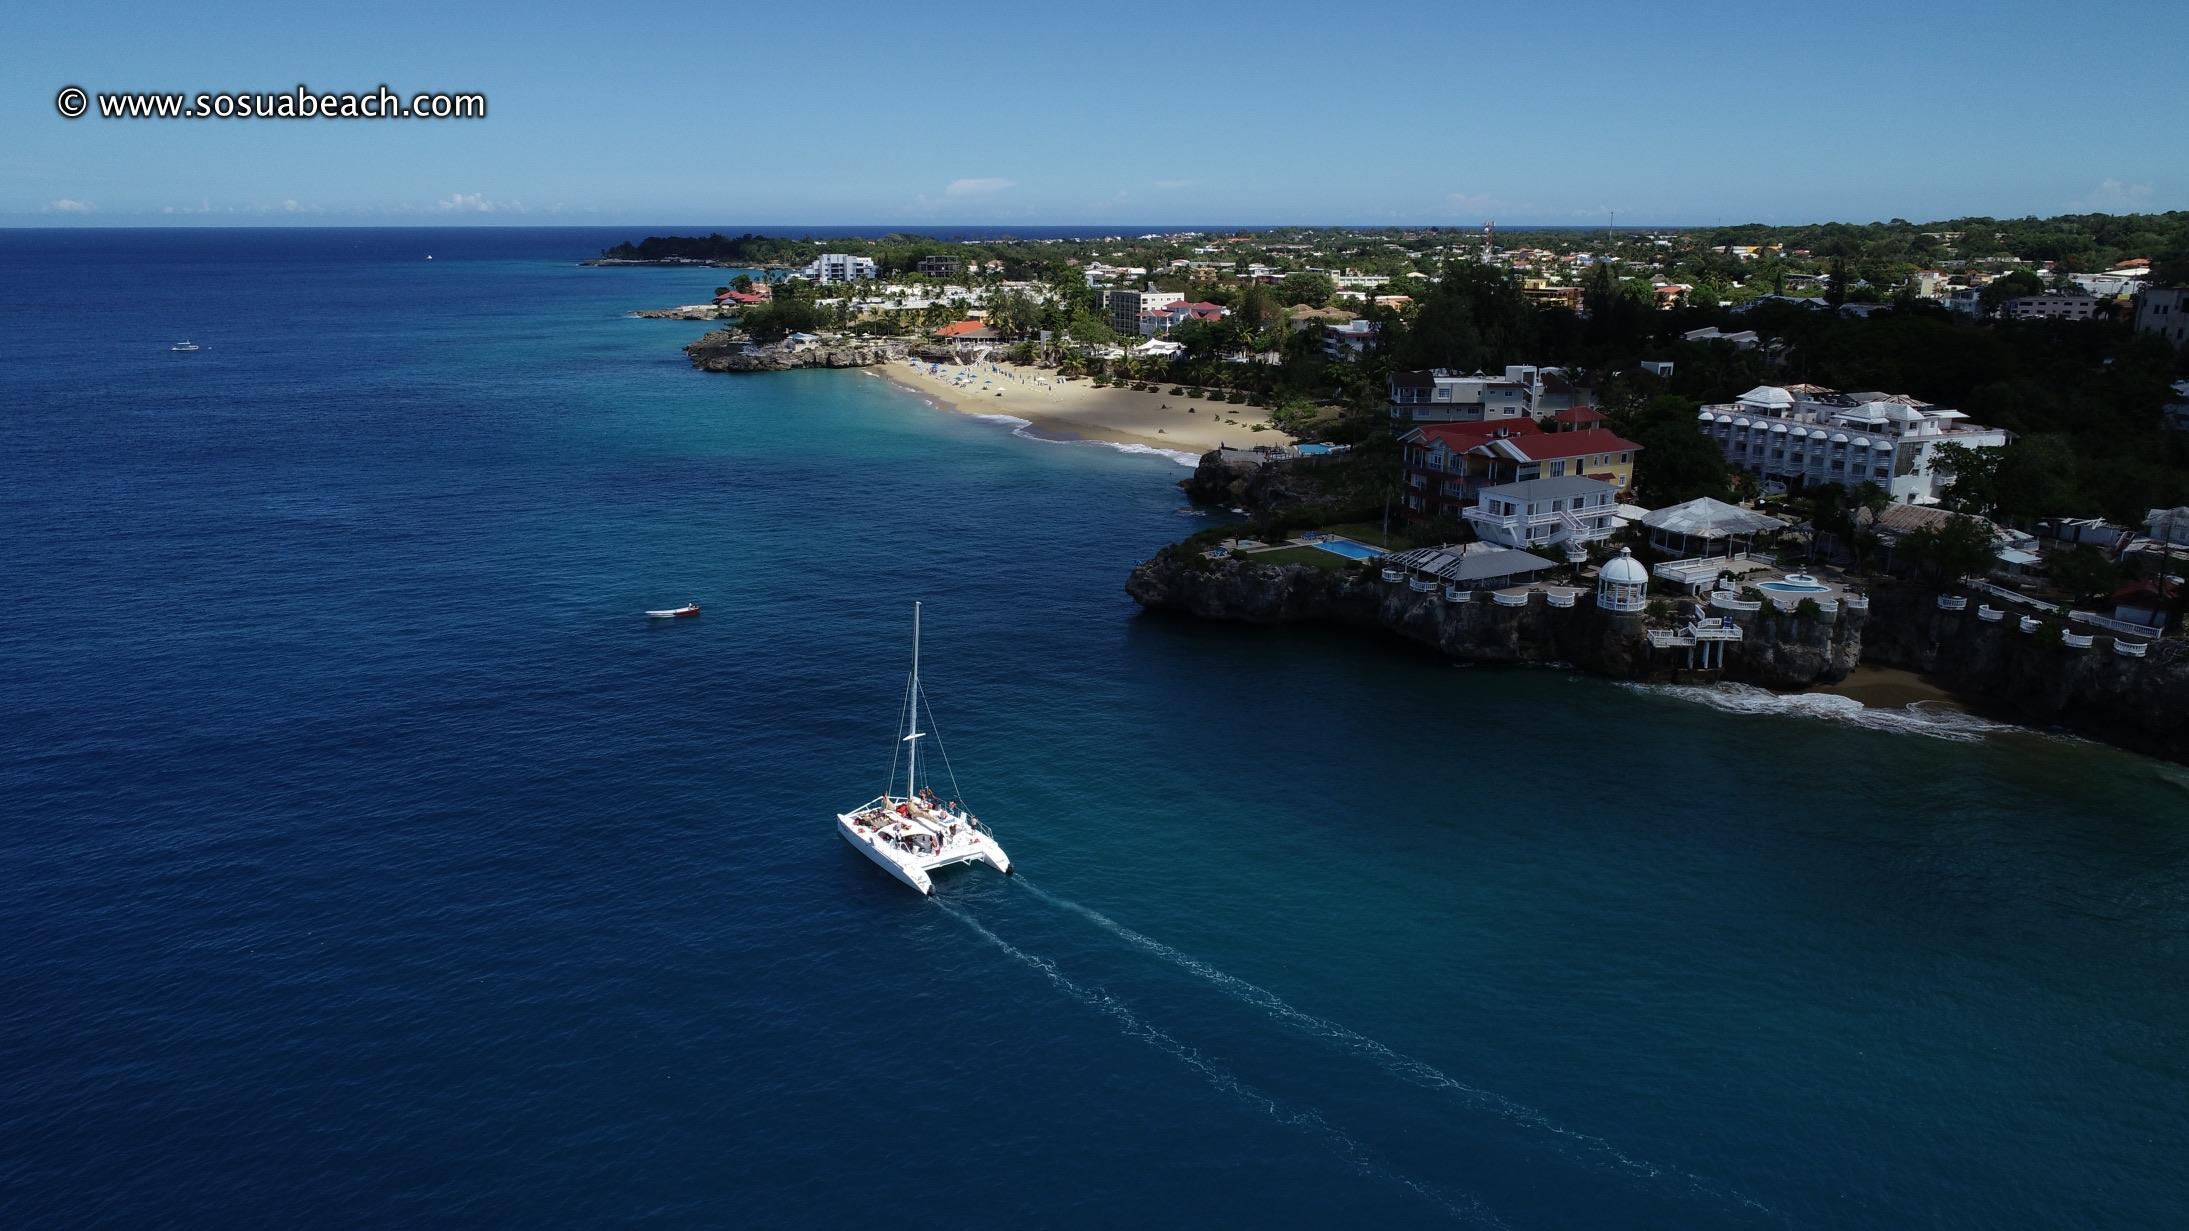 Alicia Beach and Catamaran